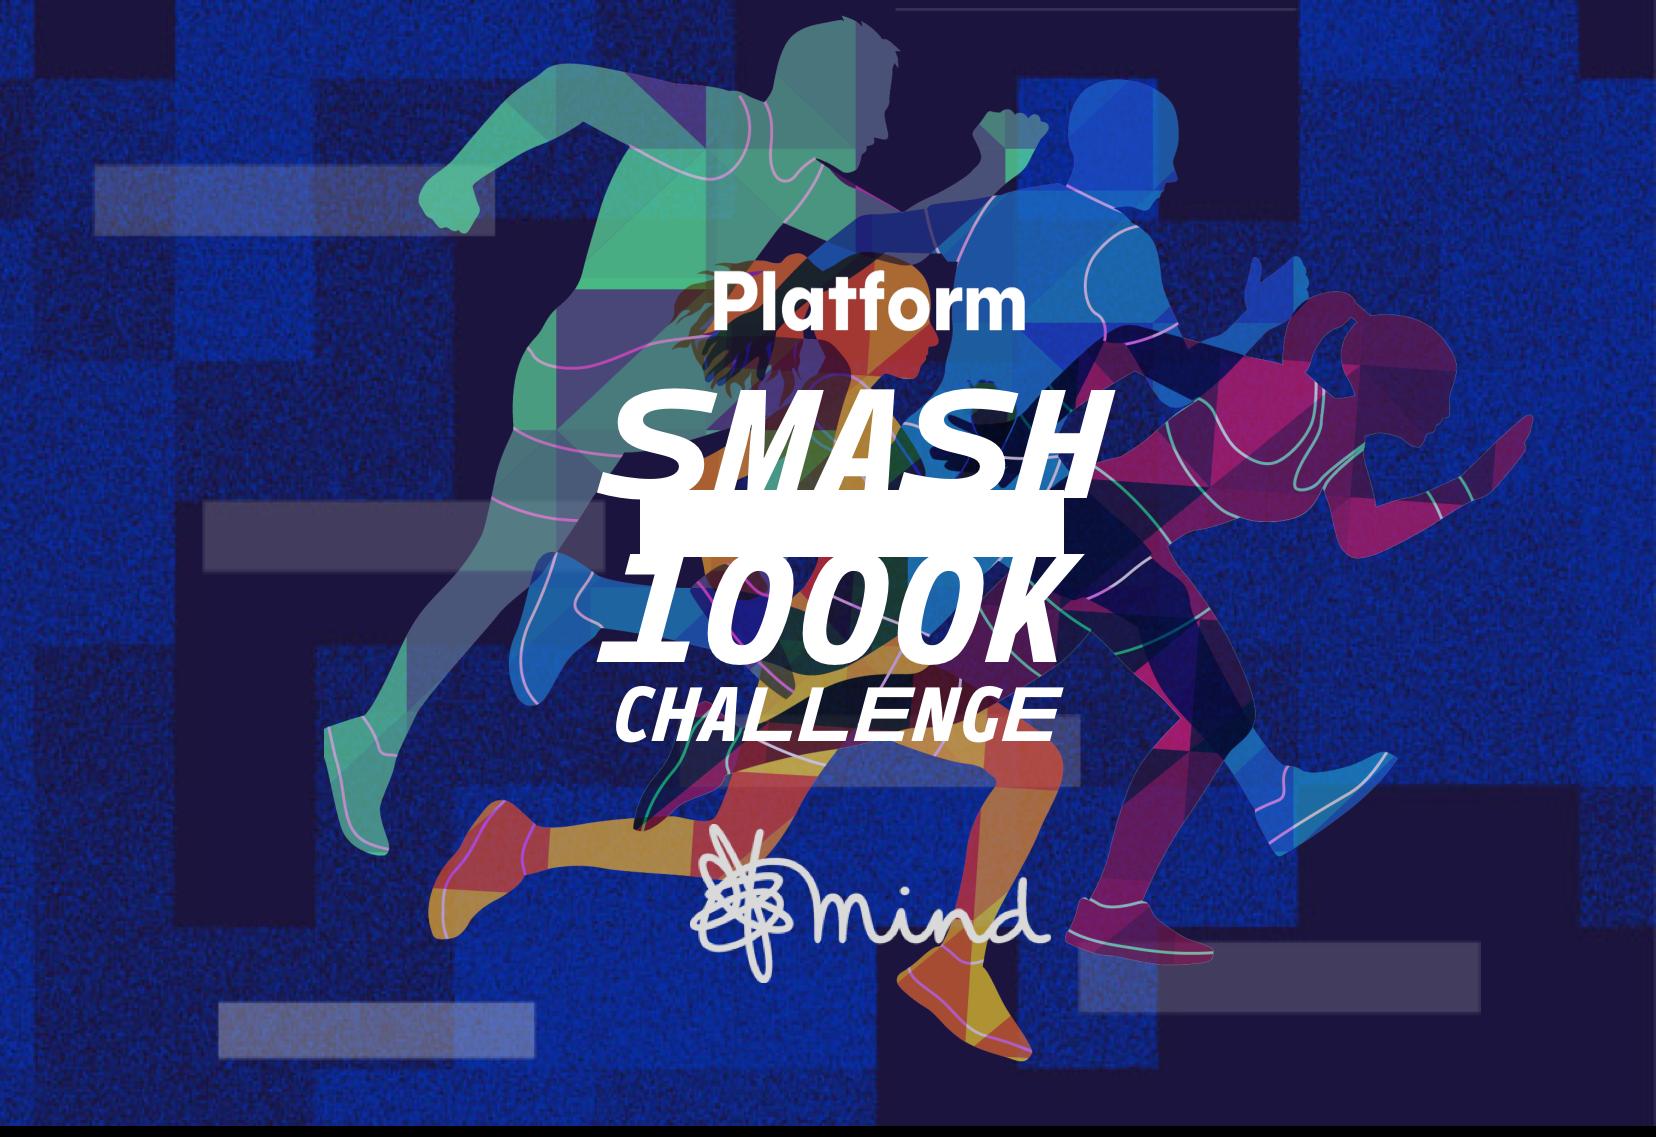 Platform Smash 100k Running Challenge